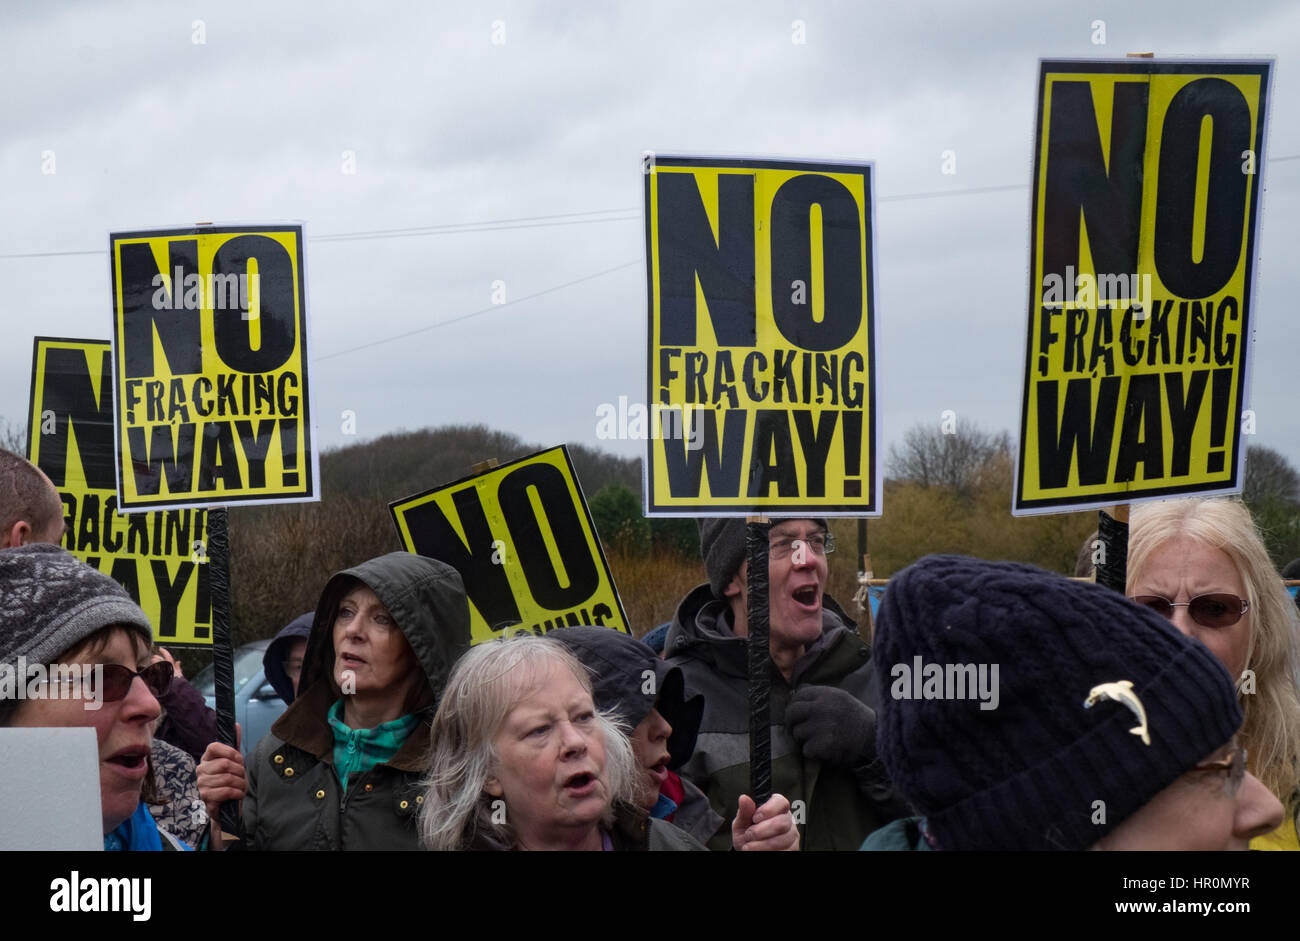 Eckington, UK. 25th Feb, 2017. Marsh Lane, Chesterfield, Derbyshire, UK, February 25th 2017, Peaceful demonstration - Stock Image